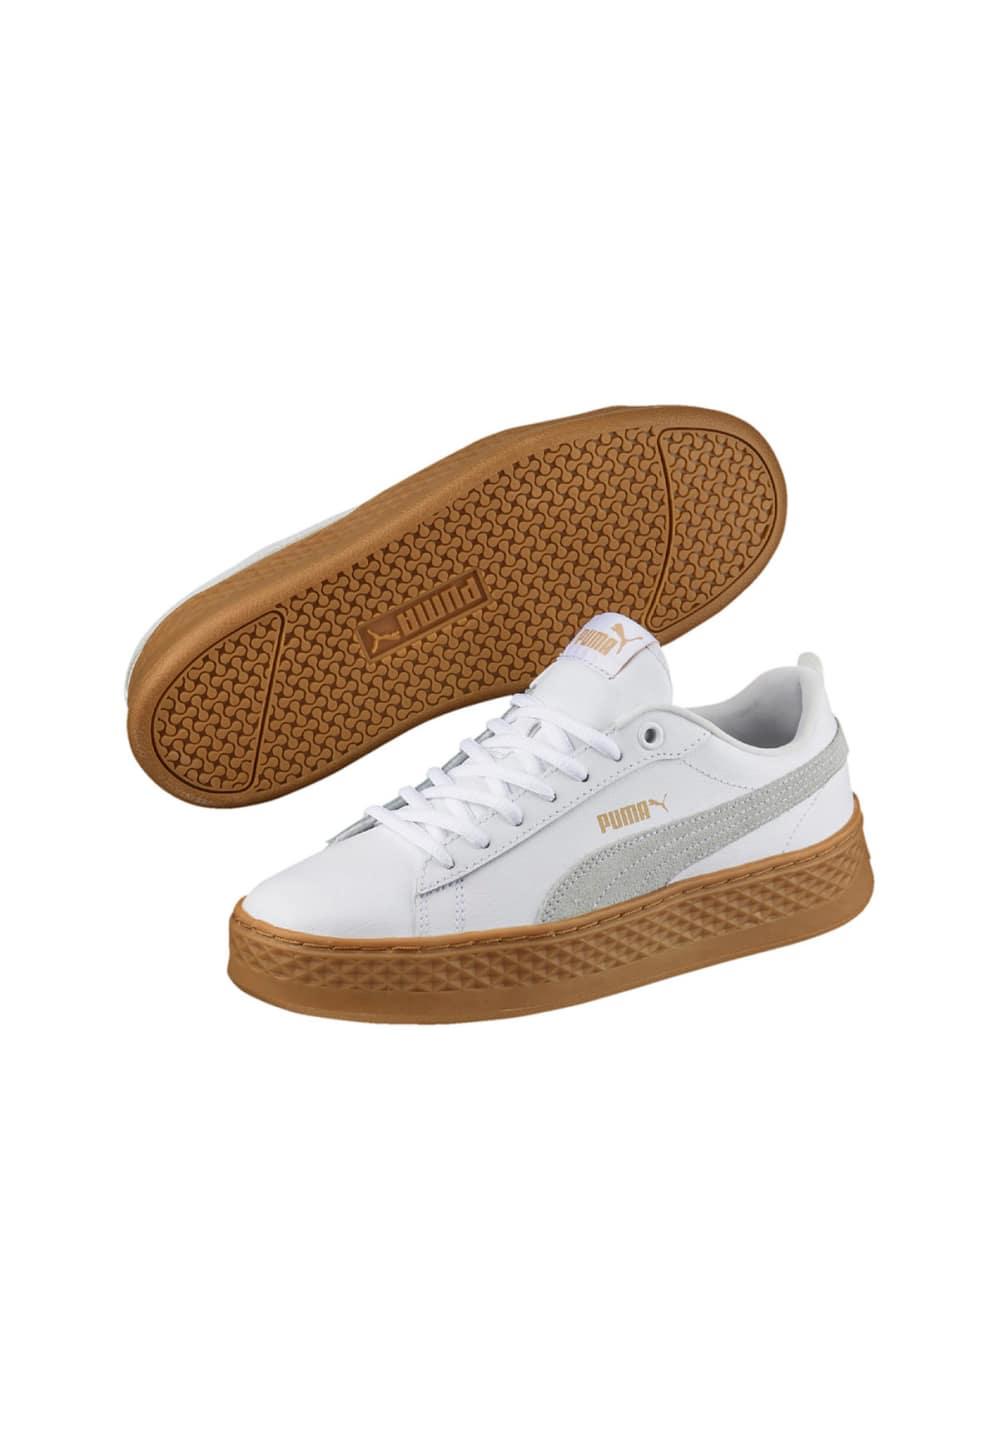 9211587fb25 ... Puma Smash Platform L - Sneaker for Women - White. Back to Overview.  -28%